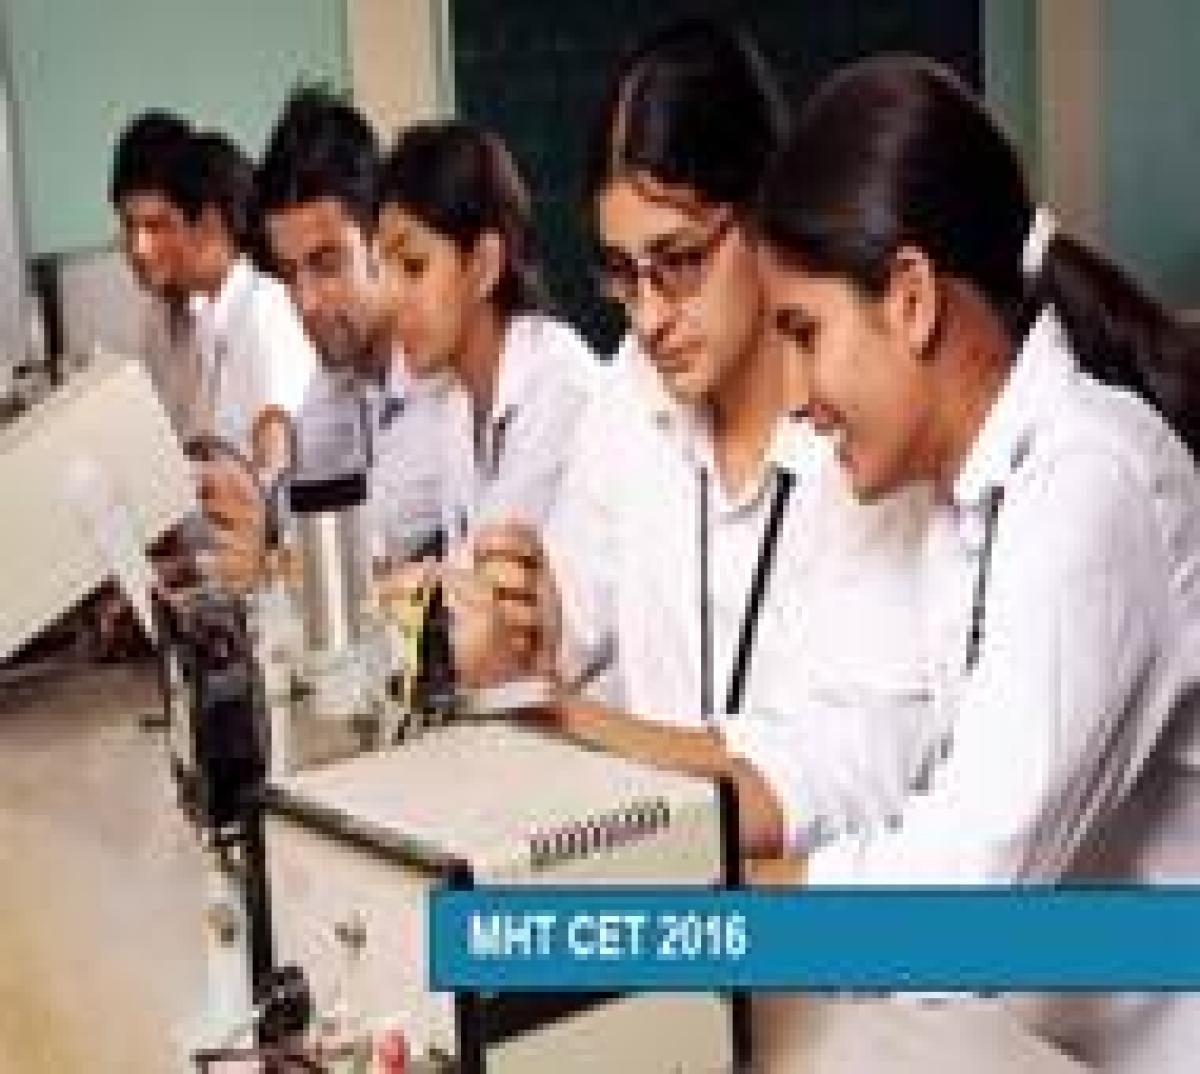 Mumbai MHT-CET 2016 results out